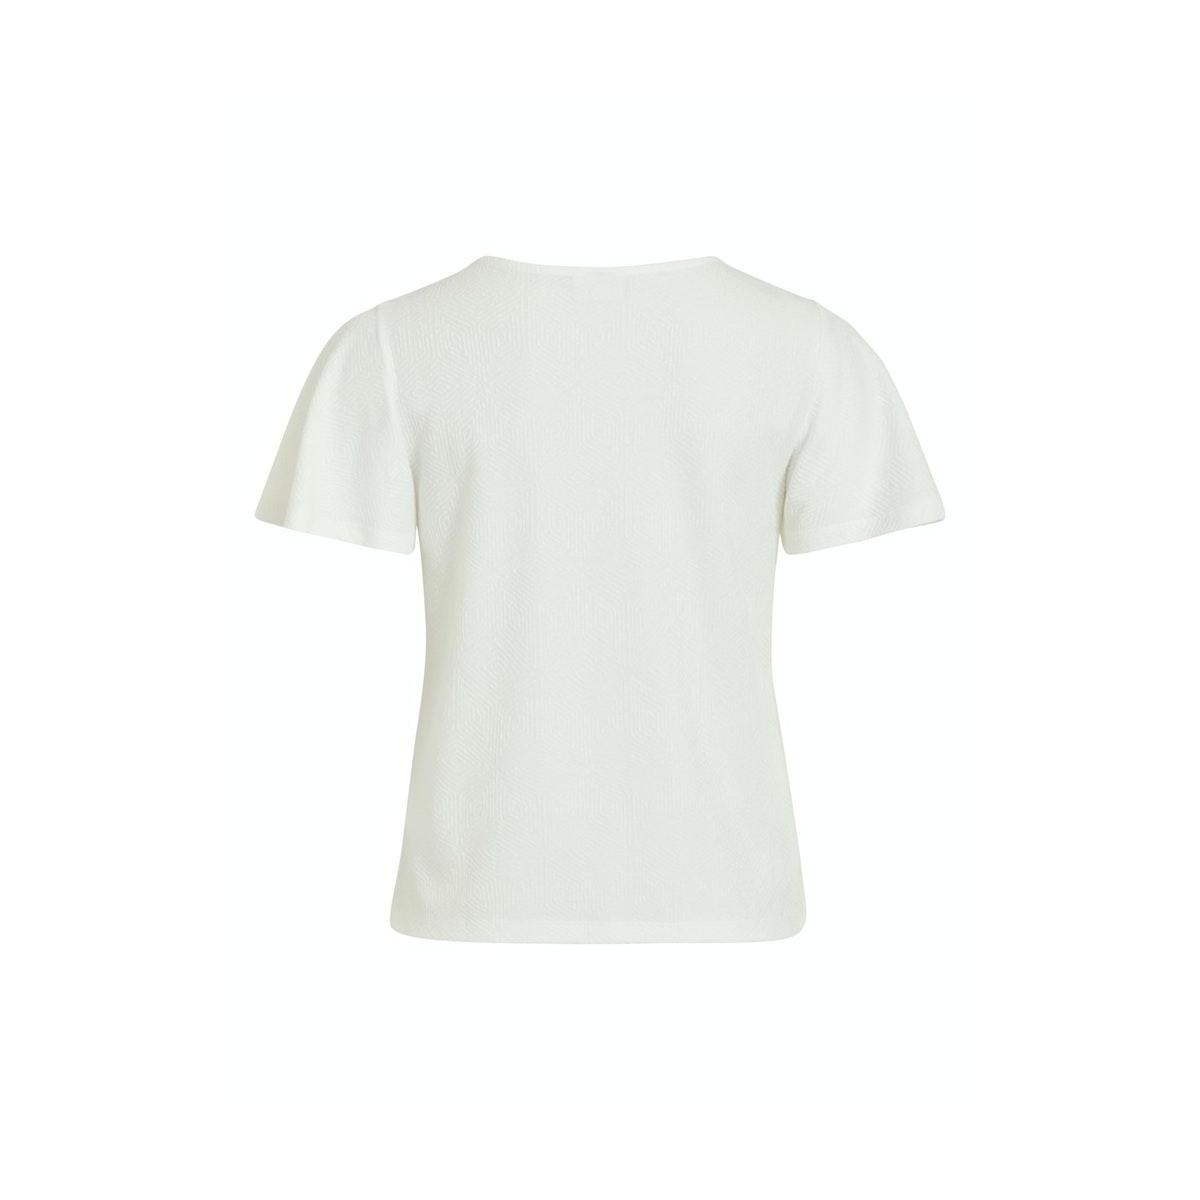 vimoana s/s top 14057403 vila t-shirt cloud dancer